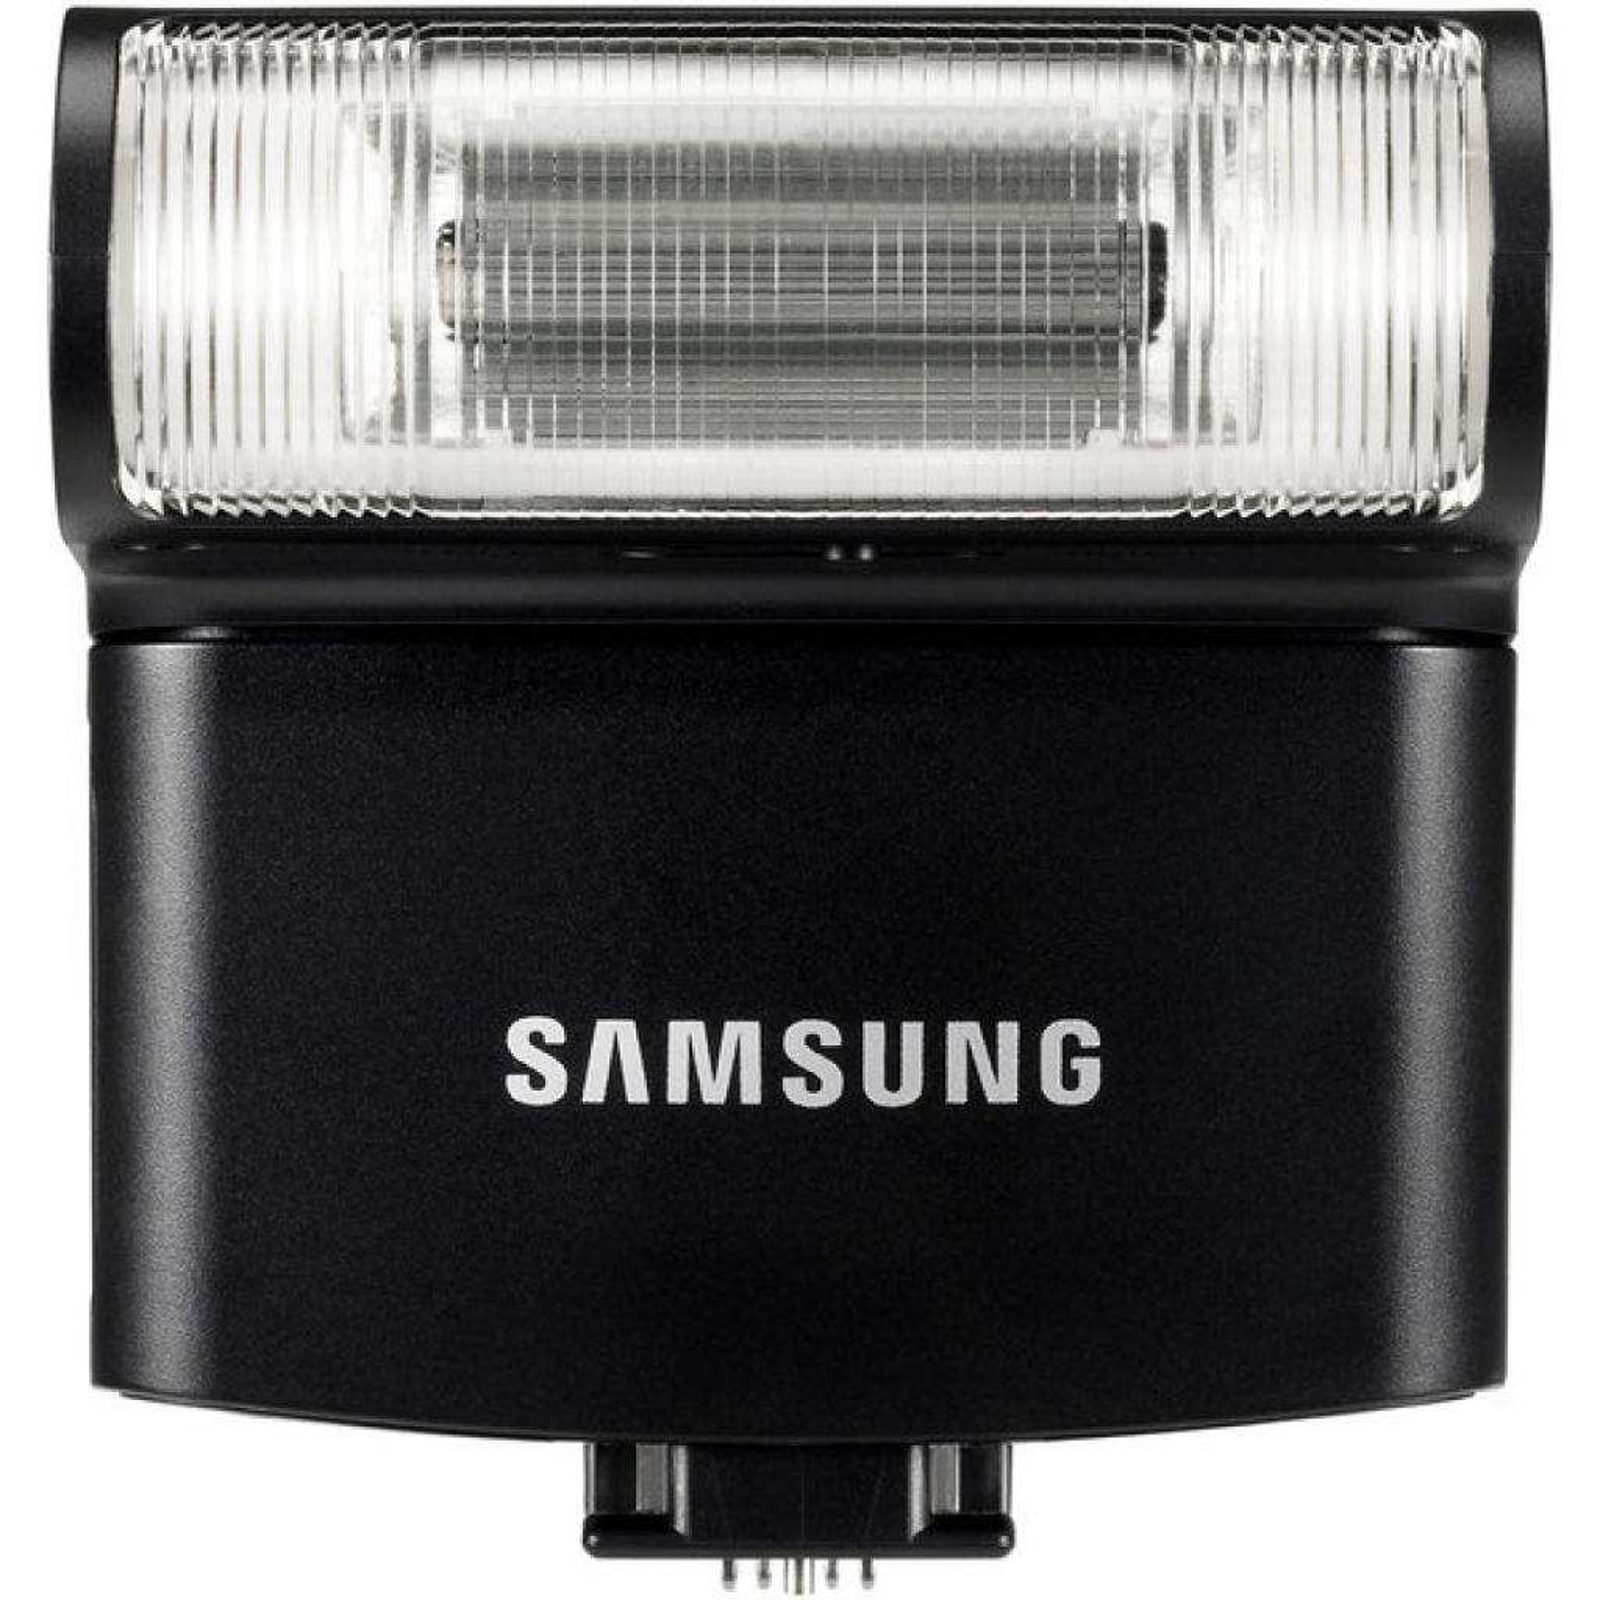 Вспышка Samsung Flash ED-SEF220A (ED-SEF220A)